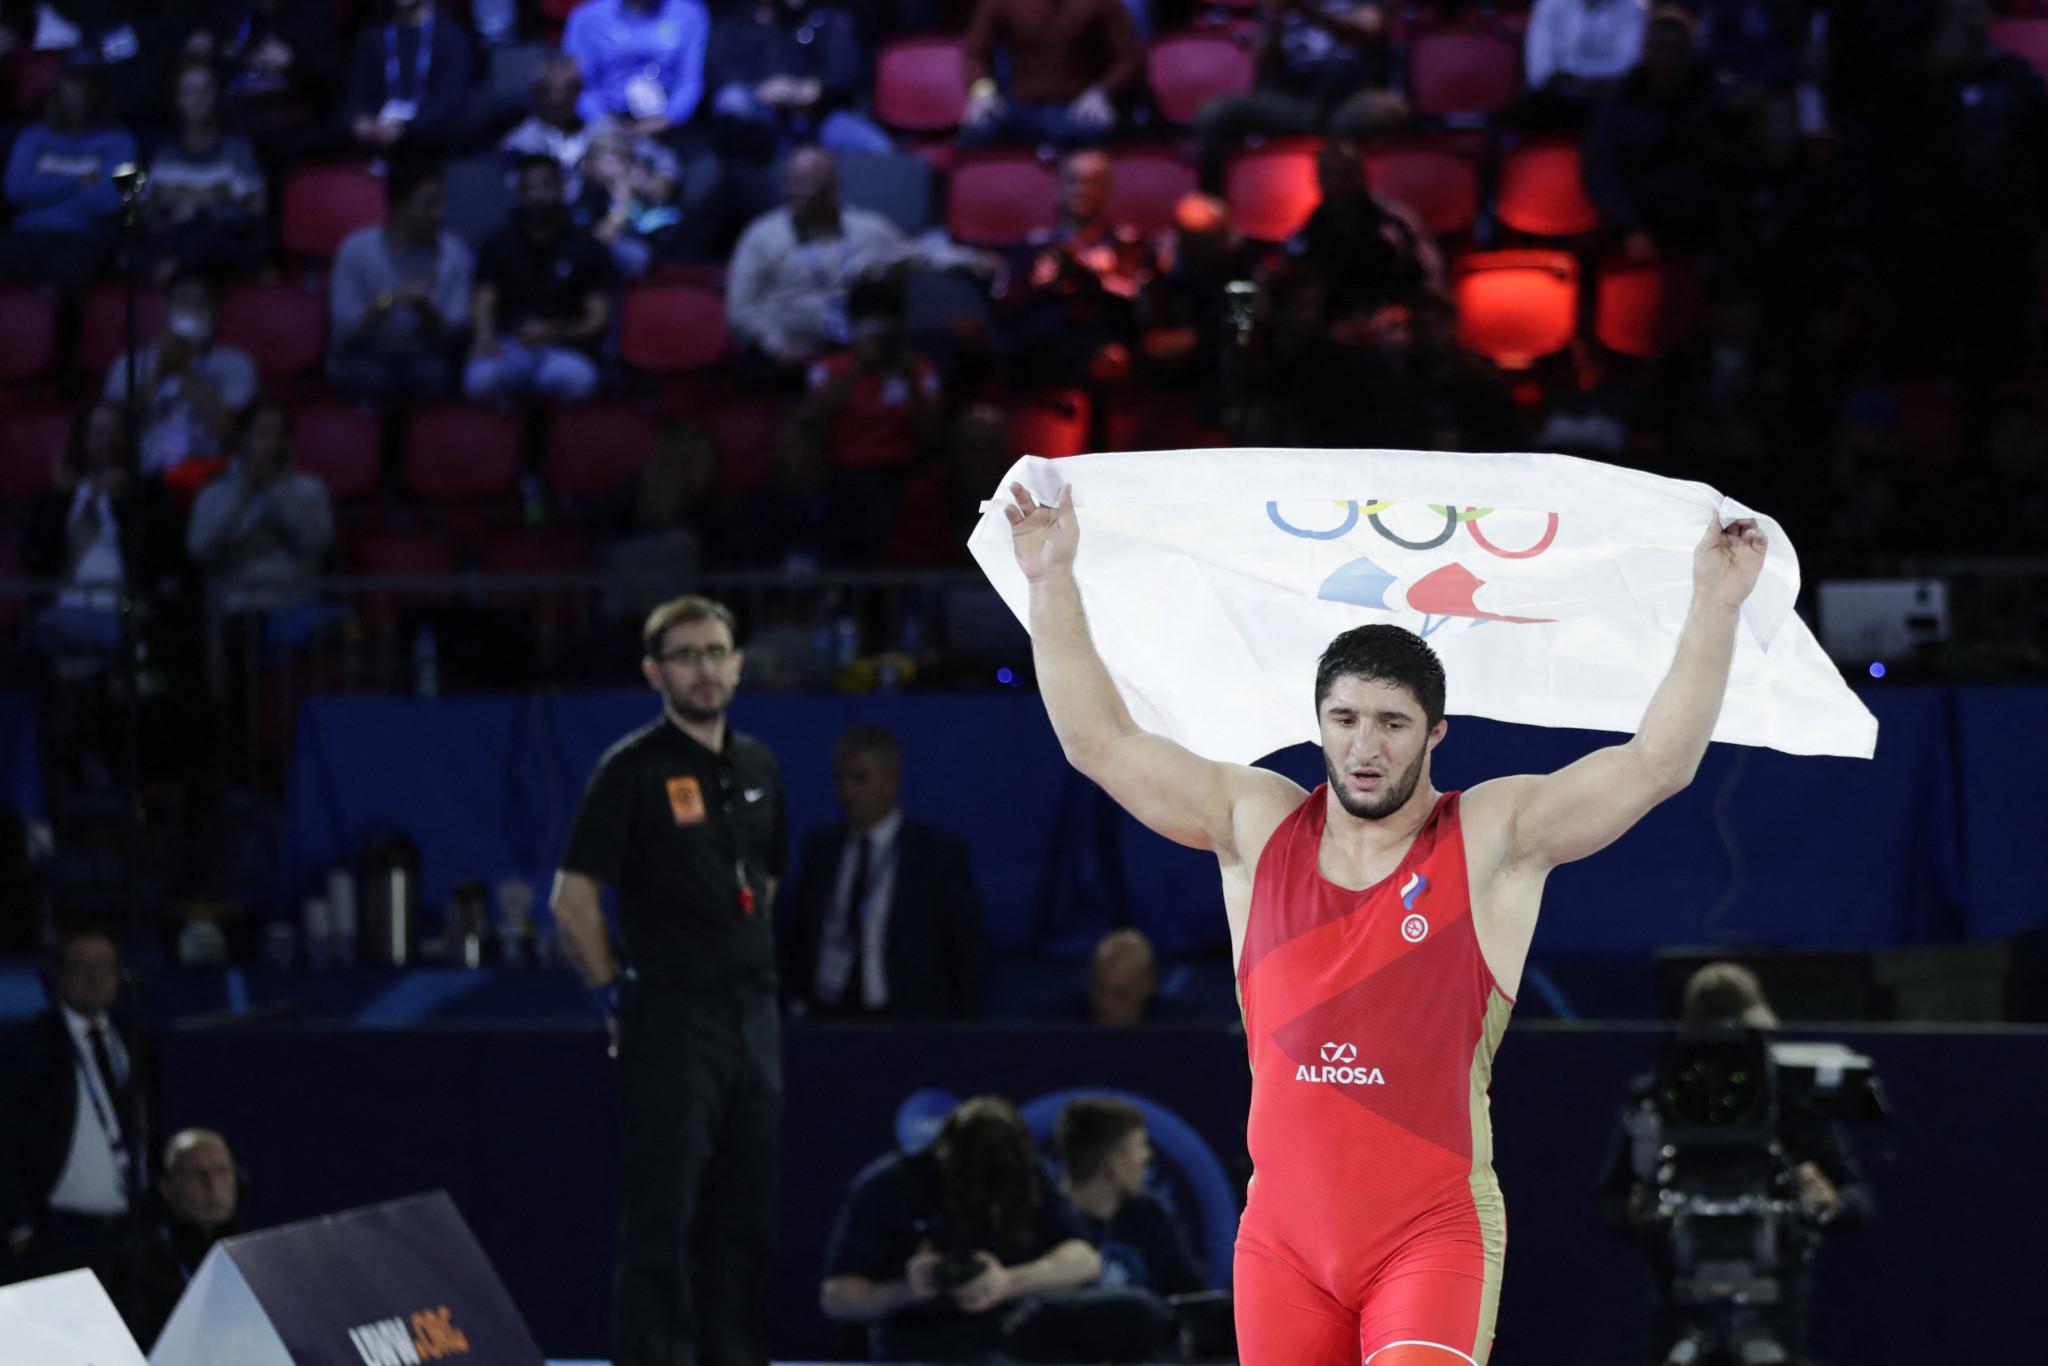 Double Olympic champion Sadulaev wins gold on fourth day of Wrestling World Championships